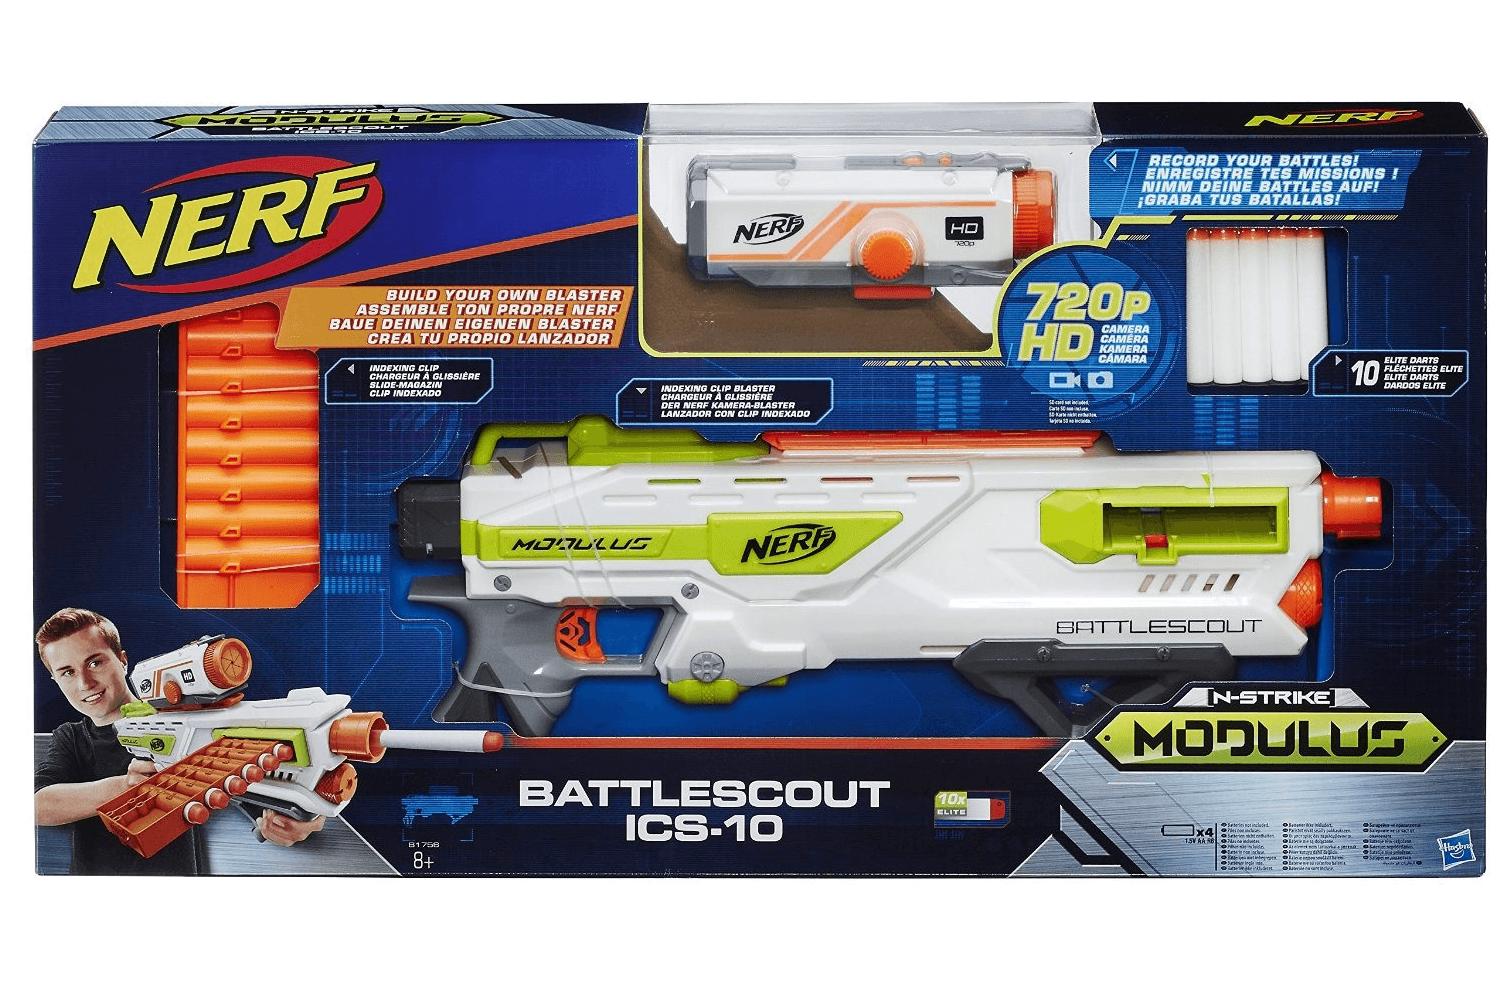 Hasbro Nerf N-Strike Elite Modulus BattleScout ICS-10 Nerf Gun 21,98€ inkl. Versand